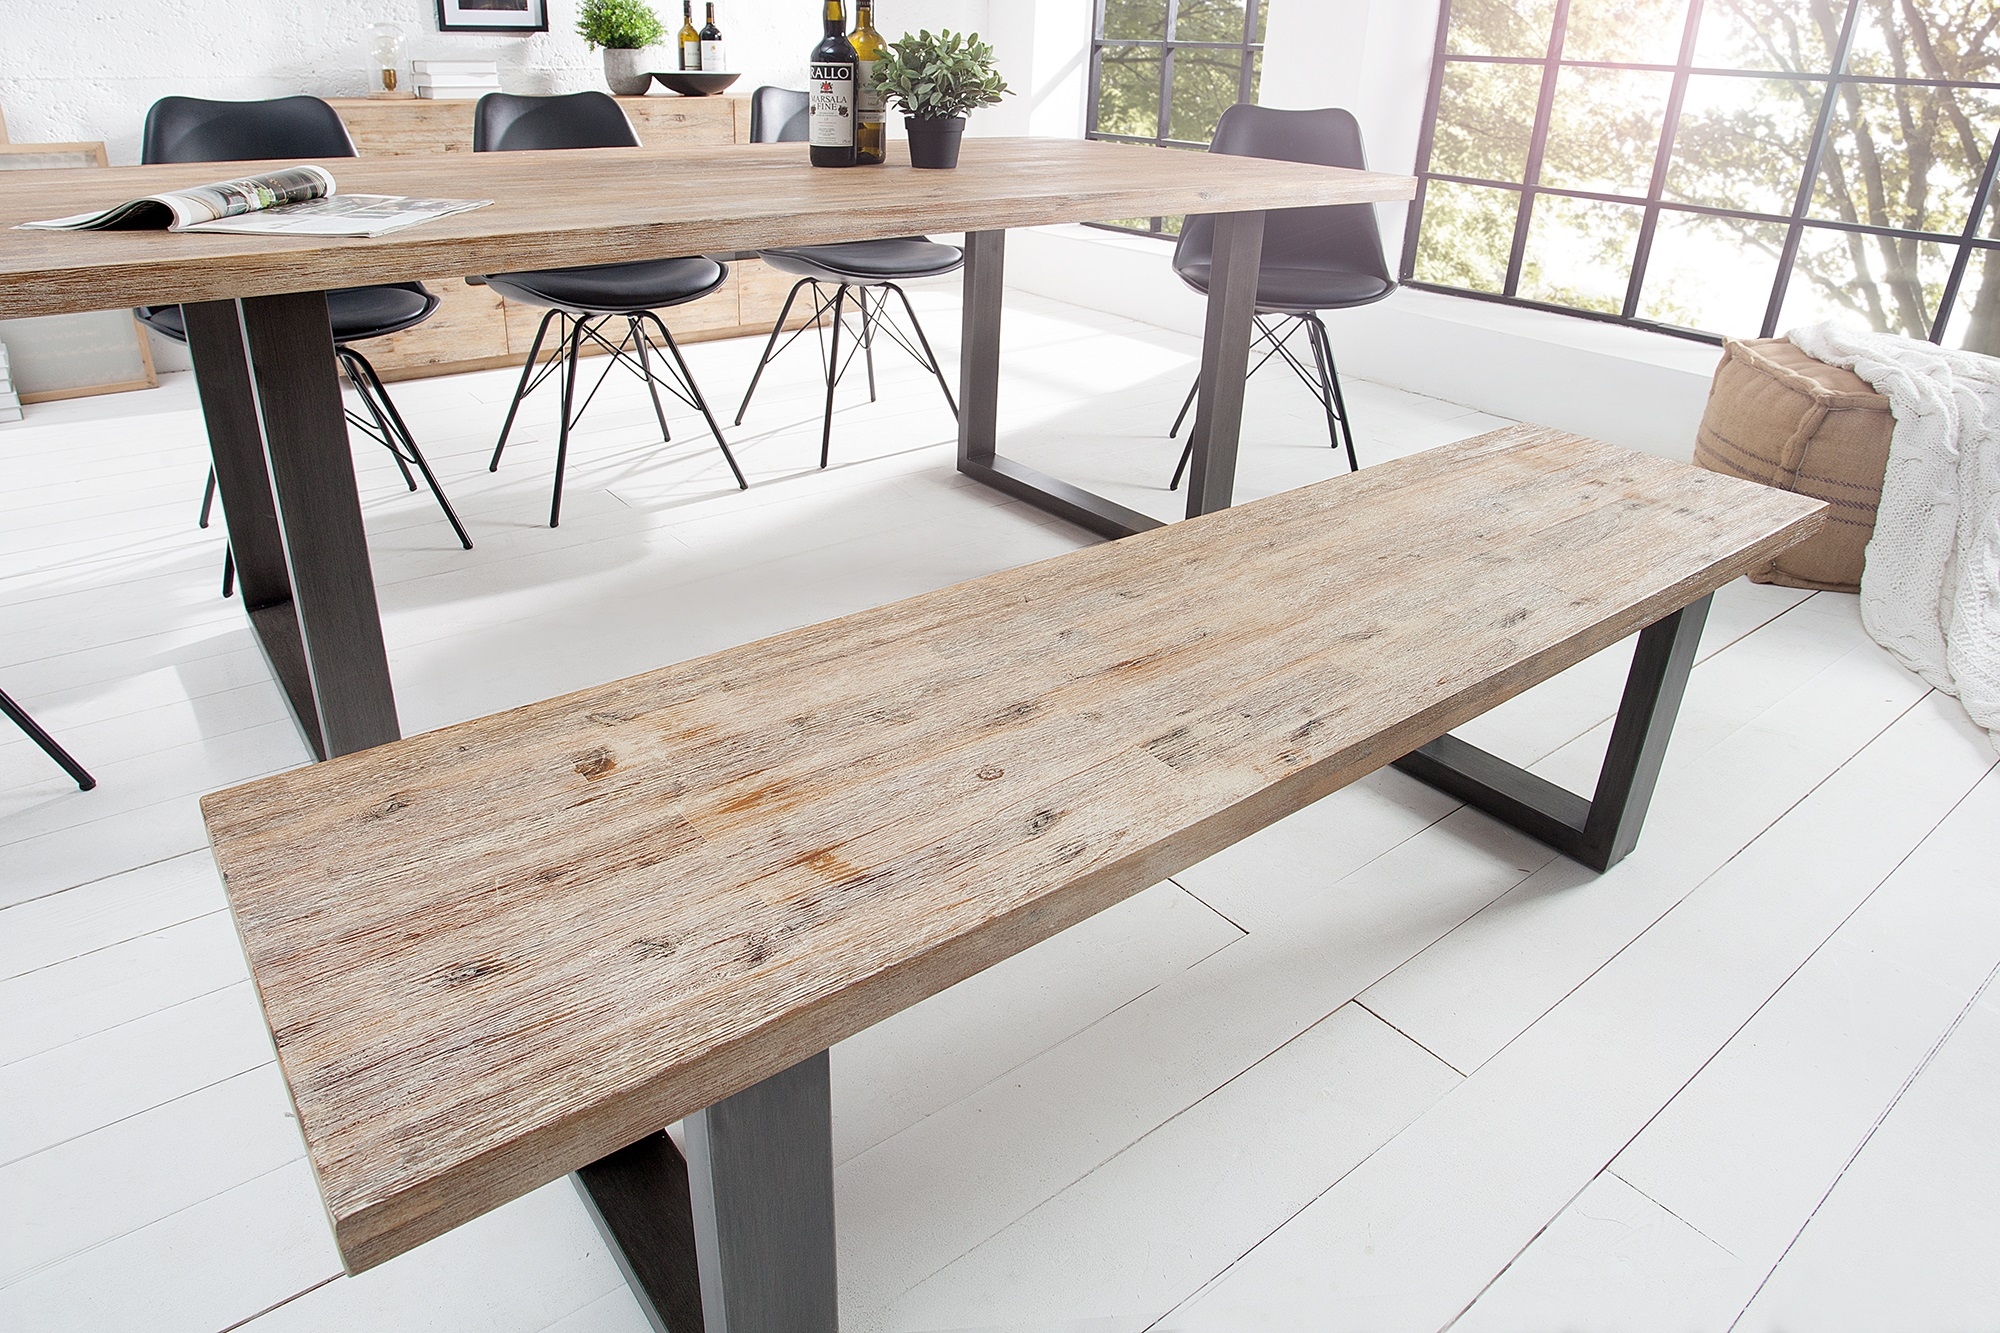 Tafel Remy Meijers : Houten bank eettafel cm: suar hout houten boomstamtafel boomstam